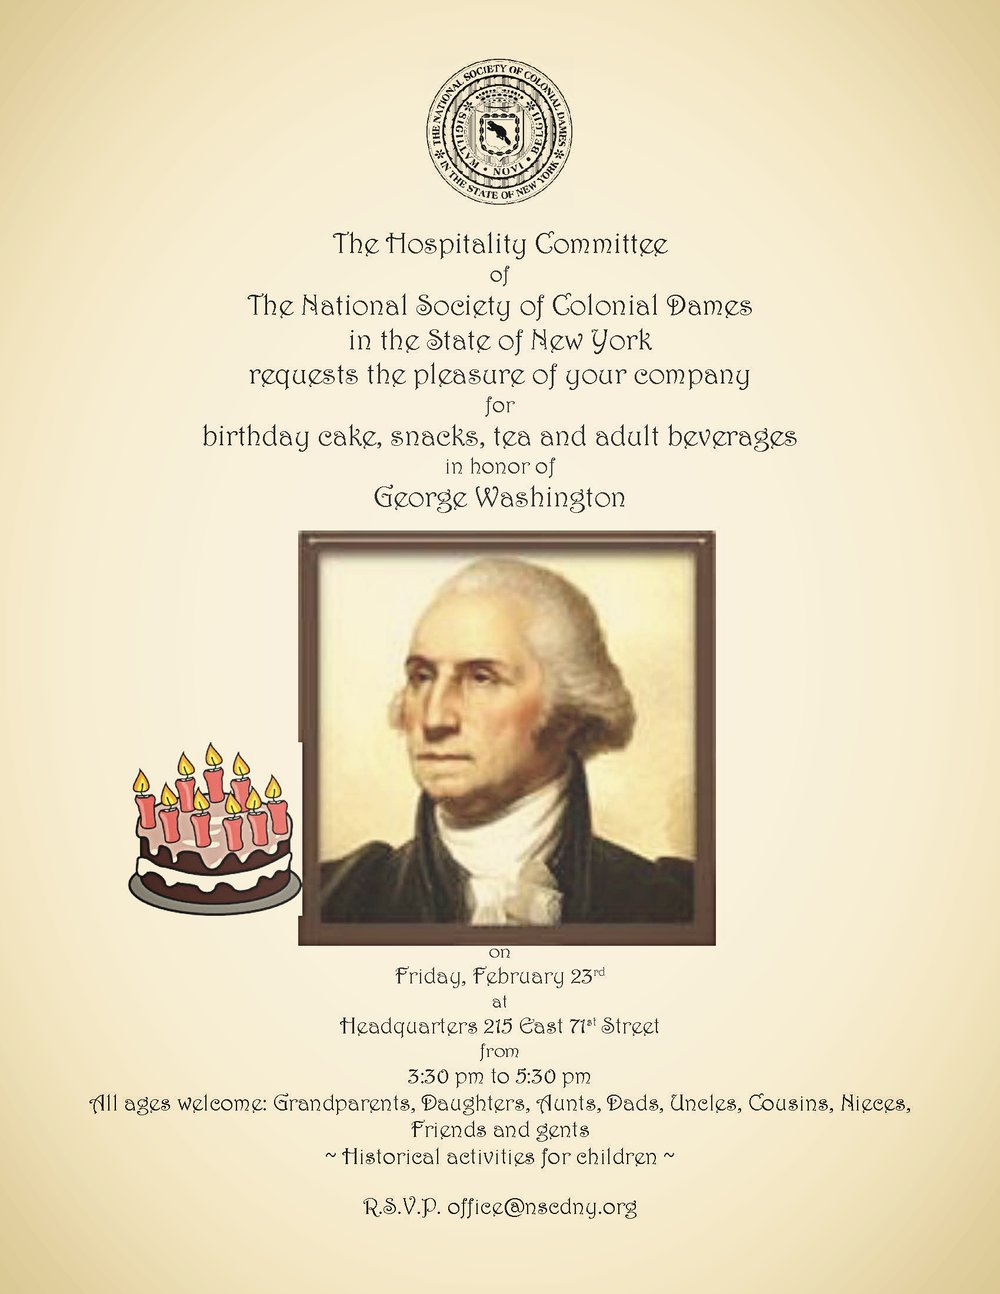 2018 George Washington brithday party 2 (2).jpg